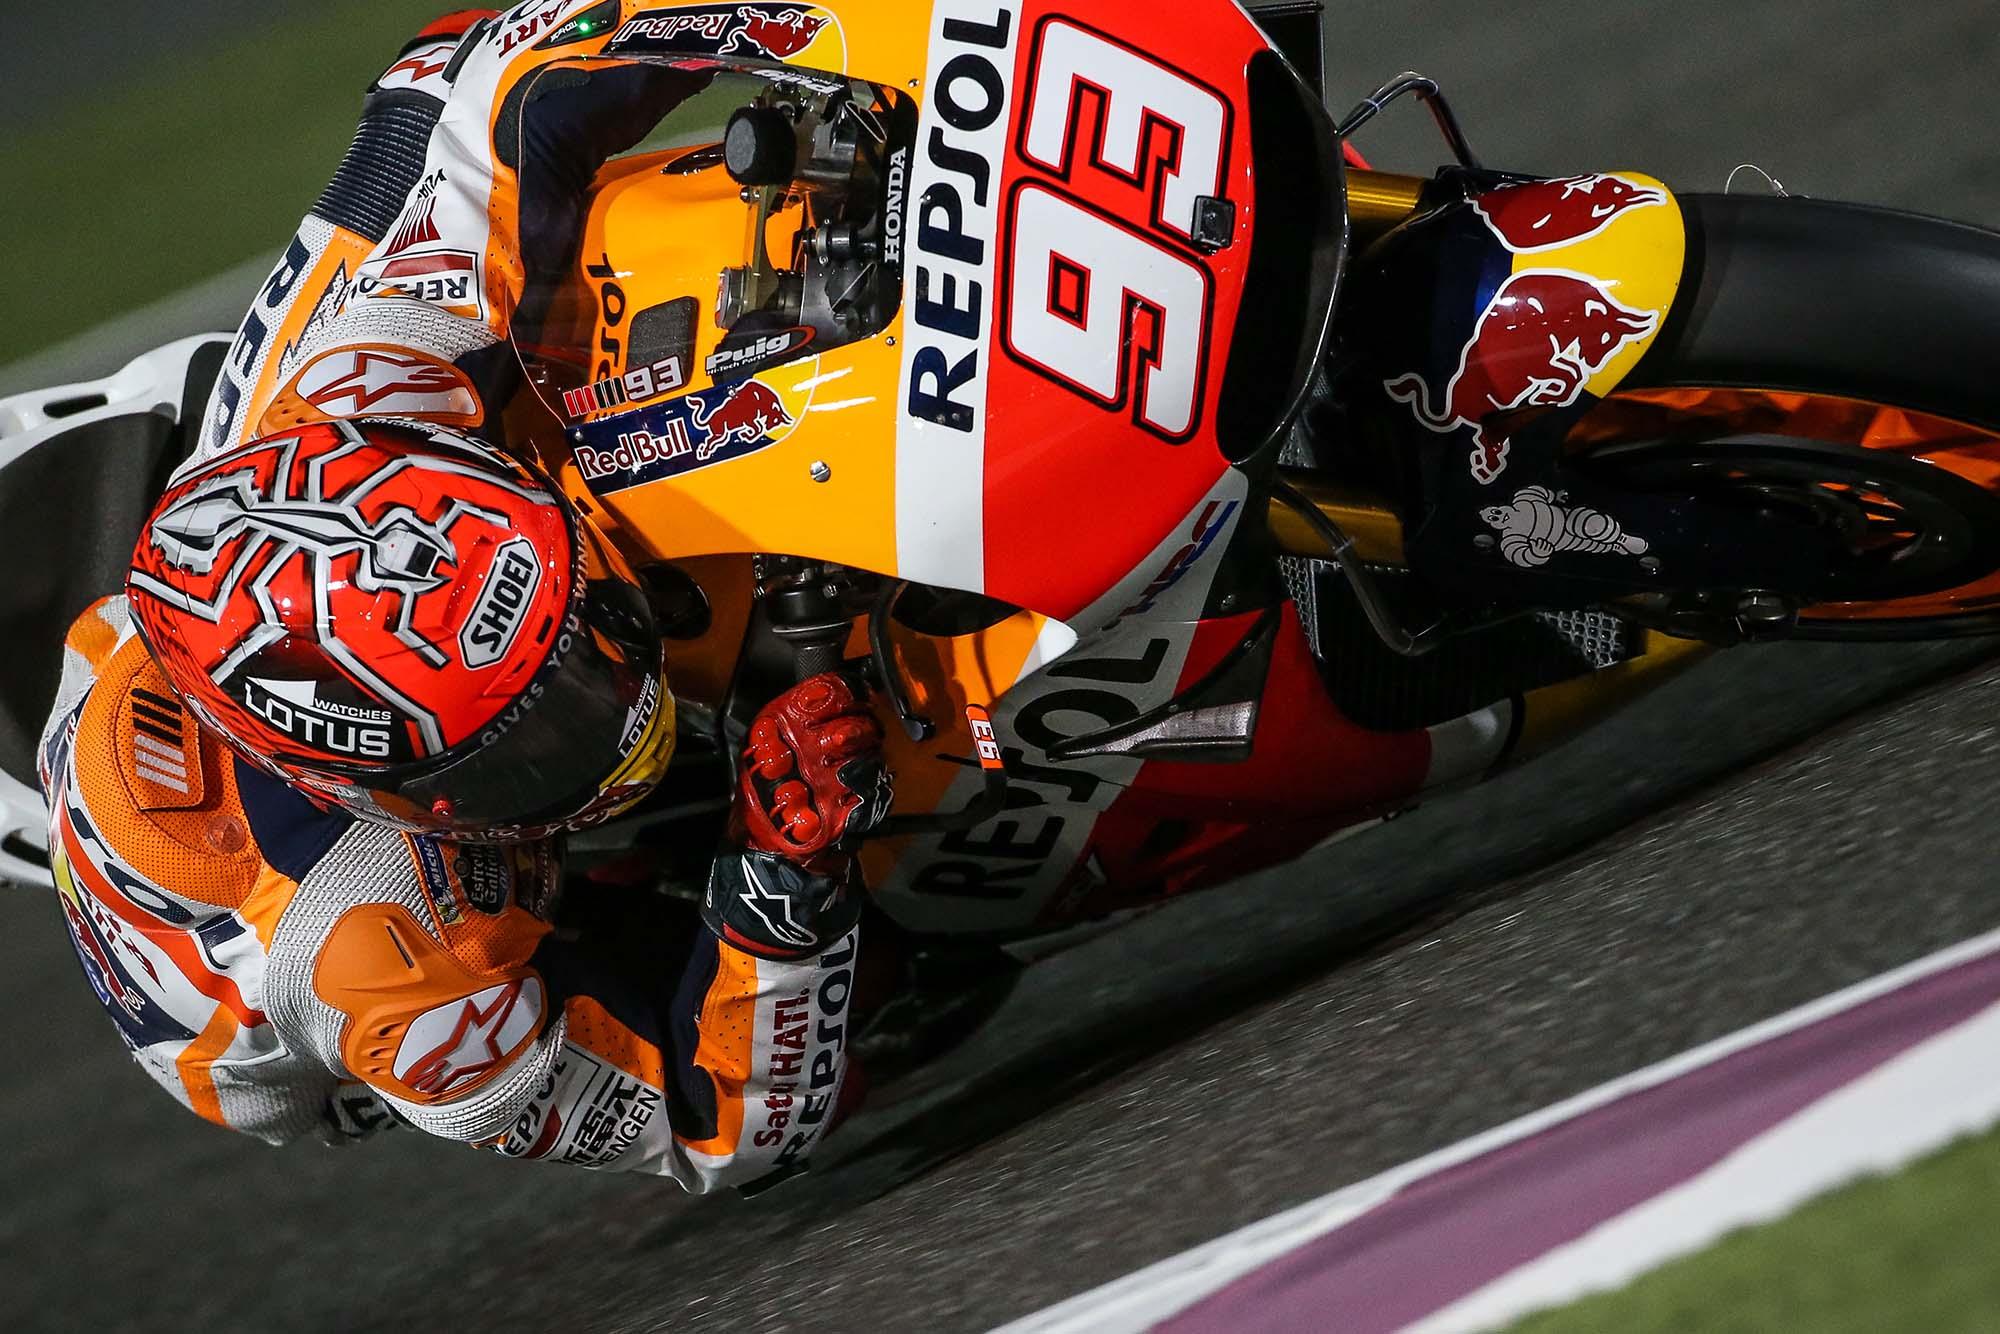 MotoGP Photos from Saturday at Qatar by CormacGP